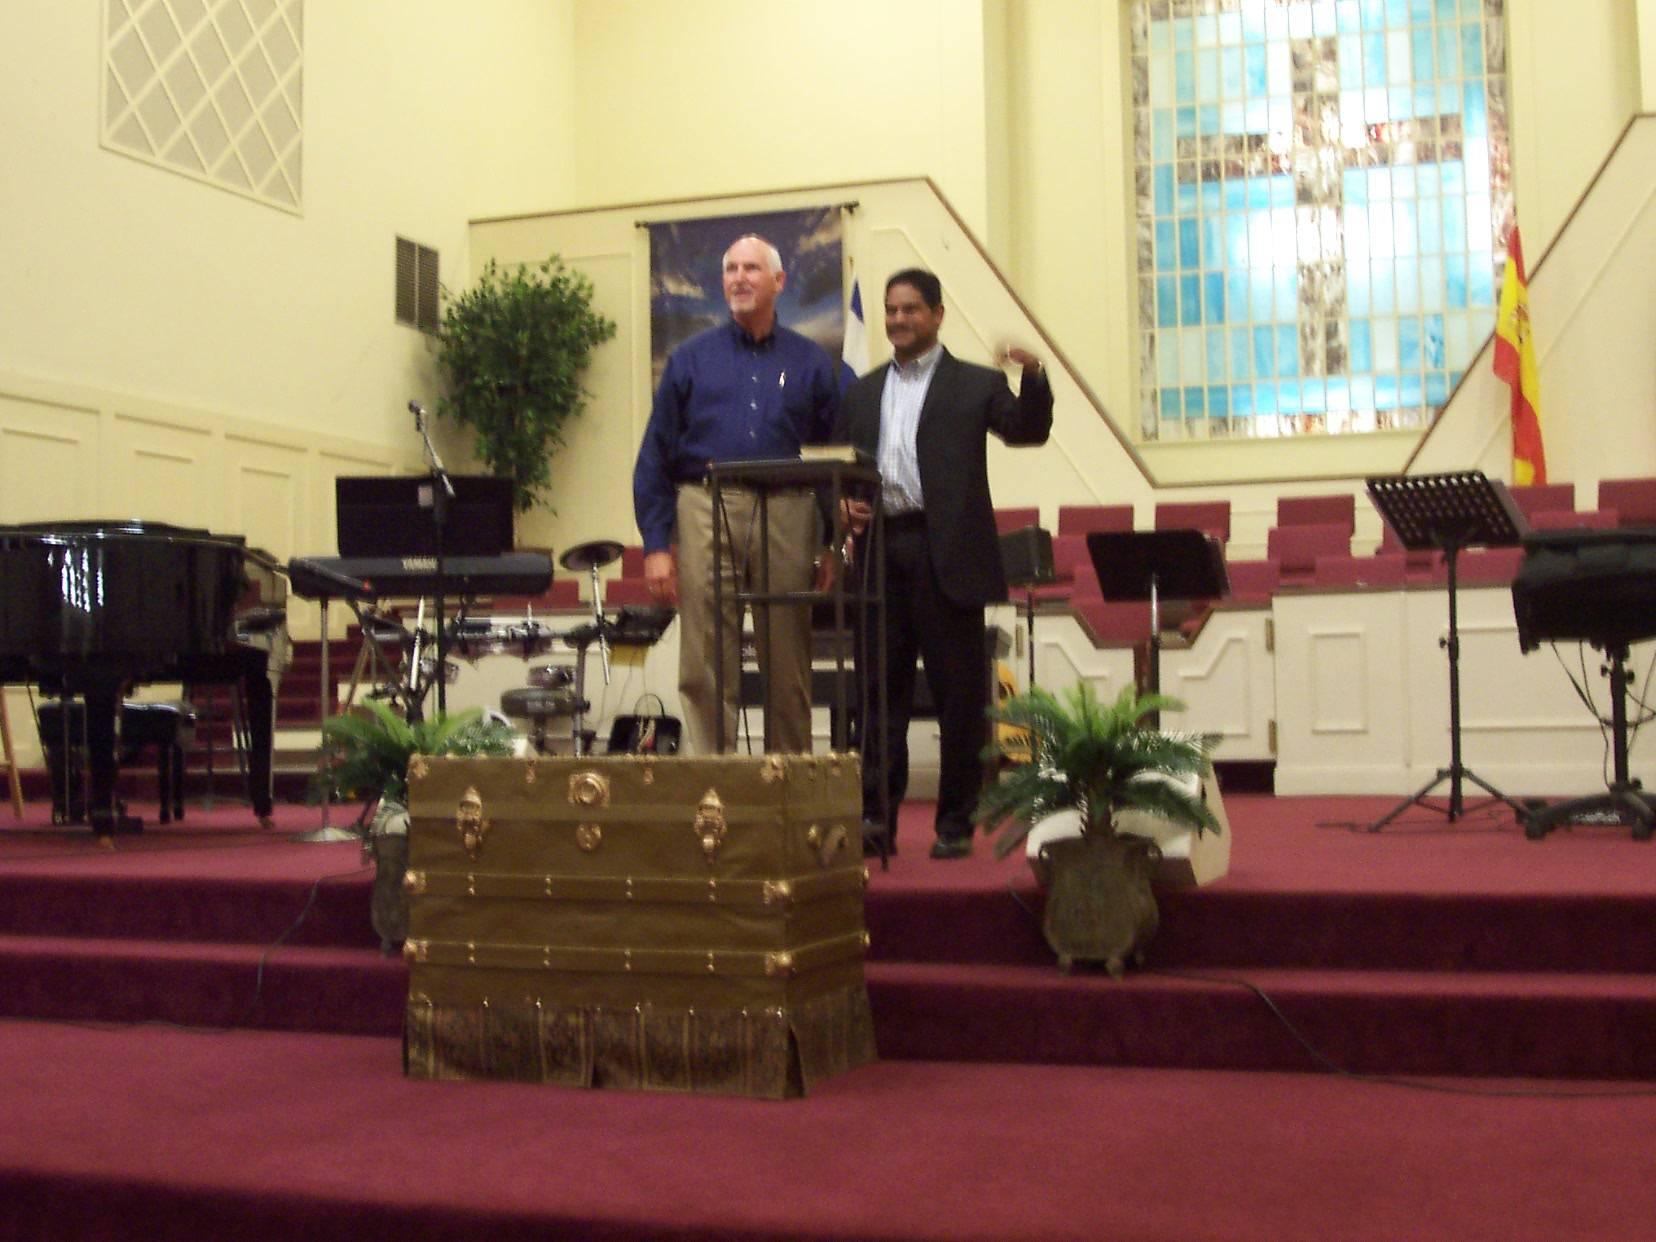 Pastor Kim Beckham and Missionary Winston Kumar